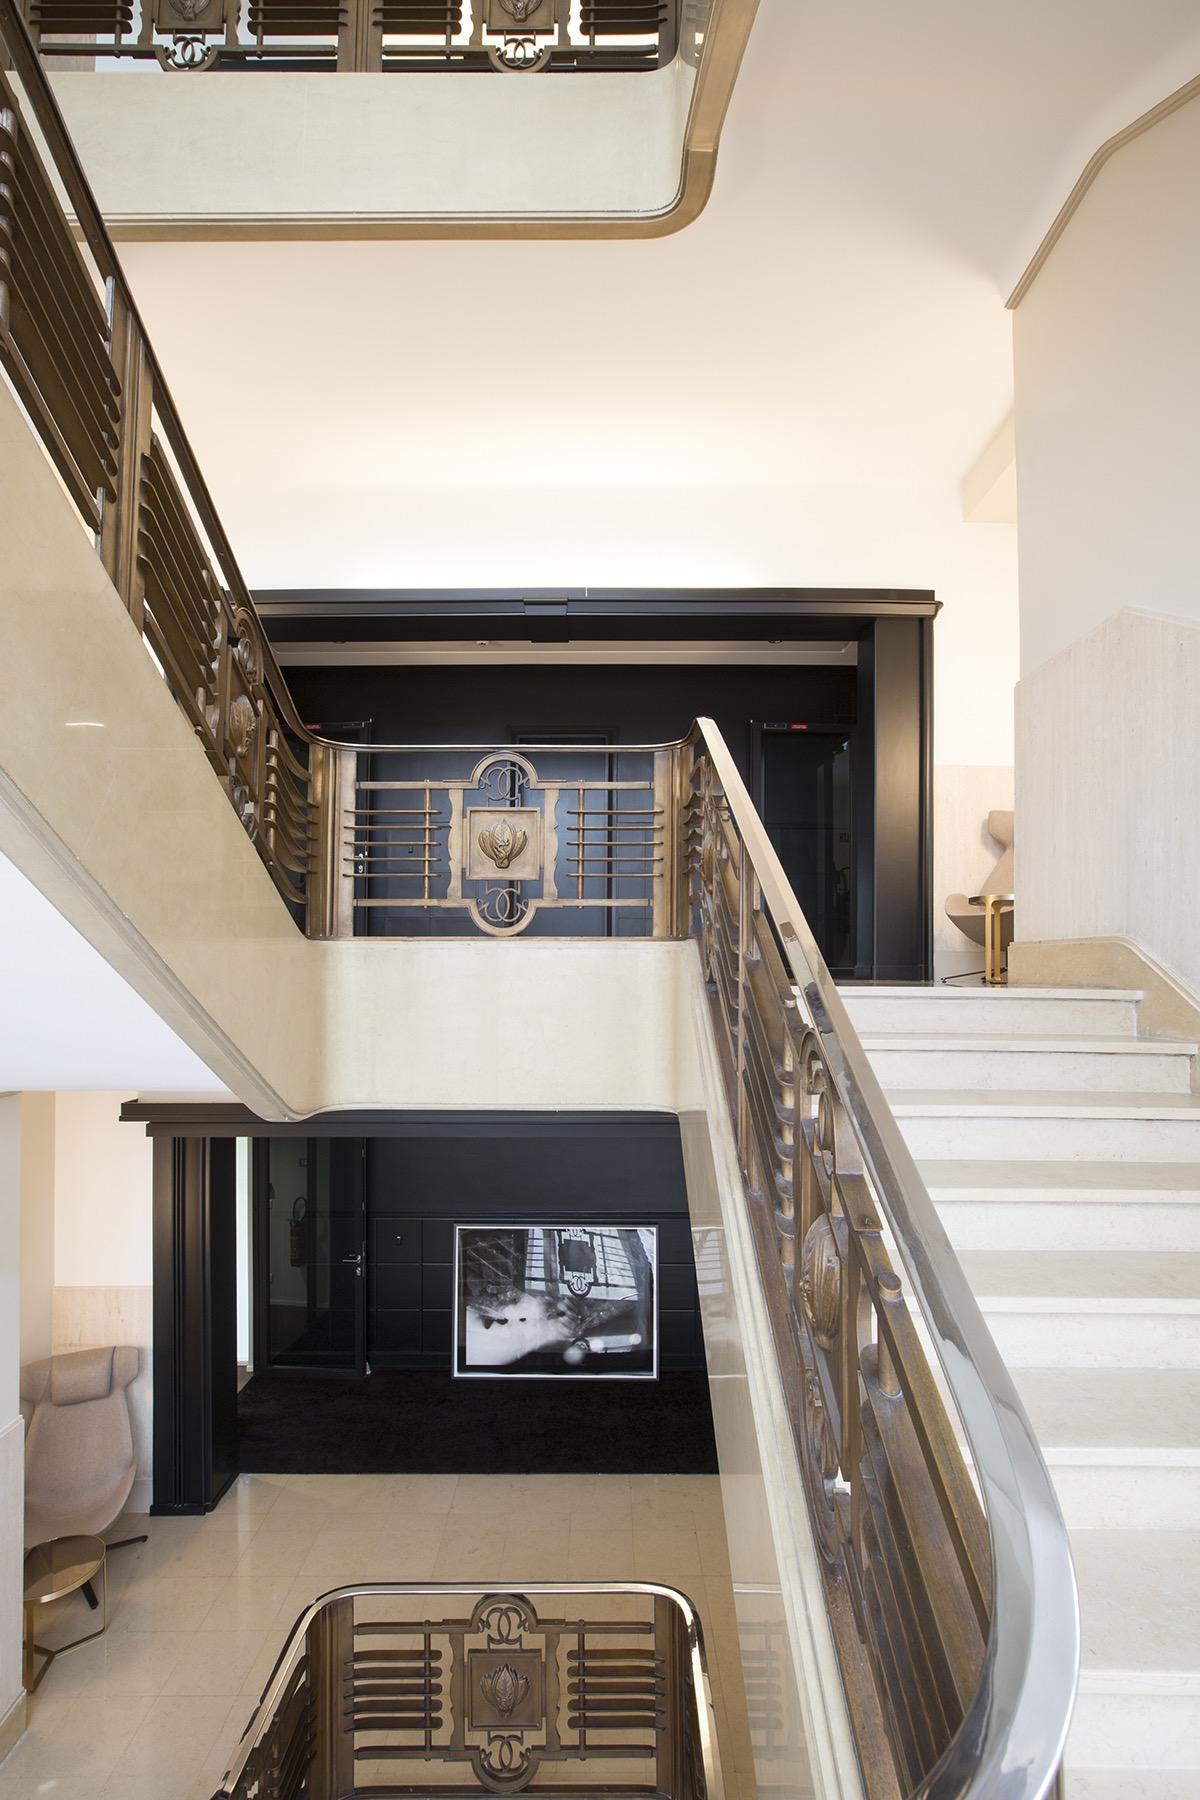 bredit-prat-paris-office-16